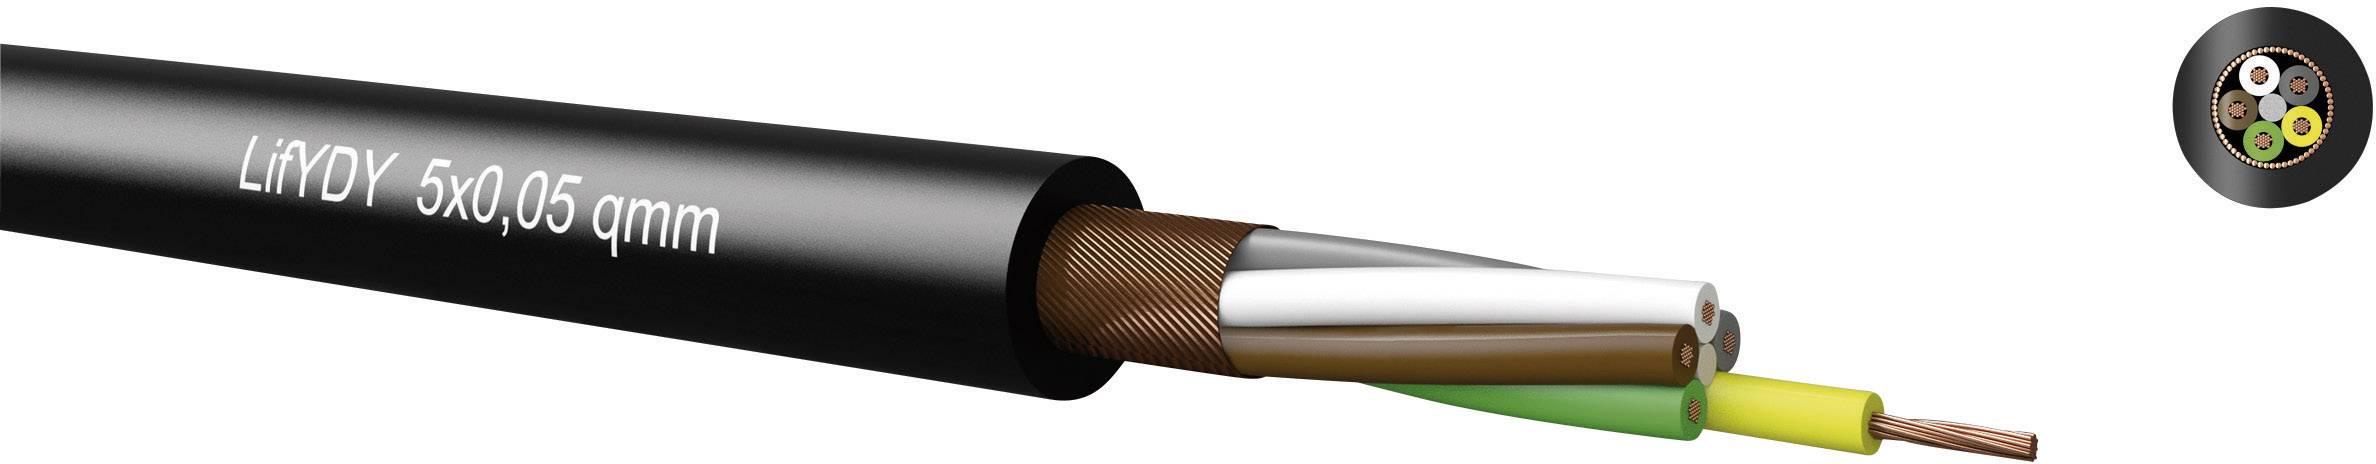 Riadiaci kábel Kabeltronik LifYDY 340800500, 8 x 0.05 mm², vonkajší Ø 3.70 mm, 100 V, metrový tovar, čierna